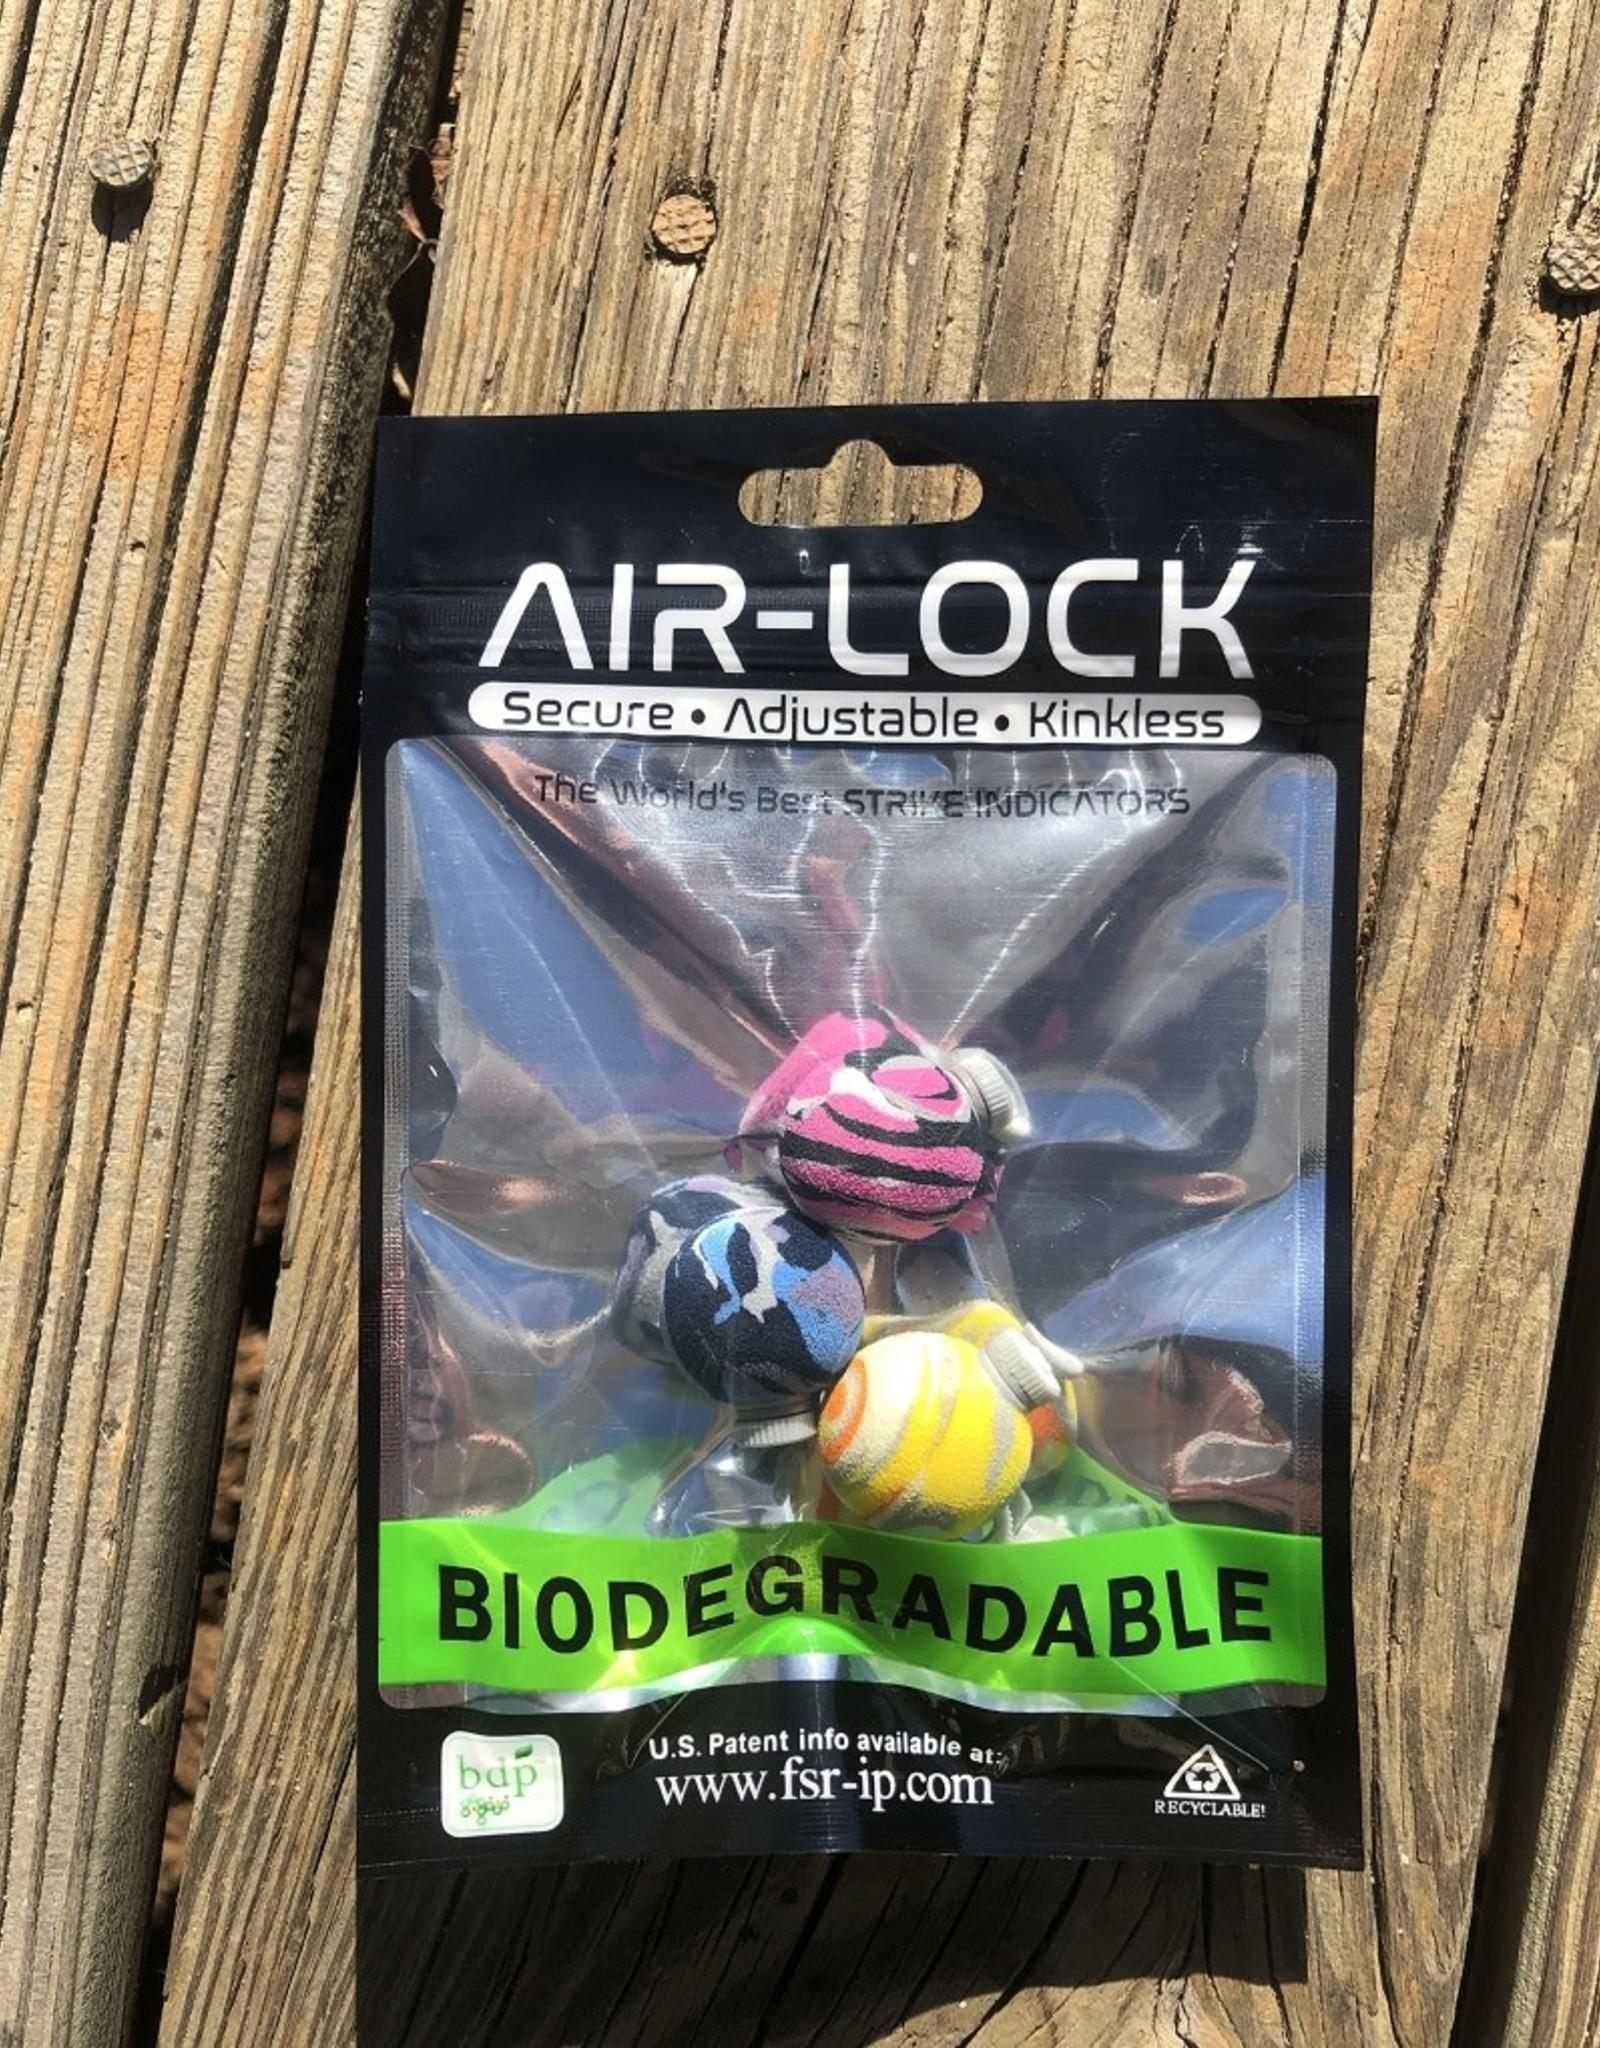 Airlock Airlock Indicators